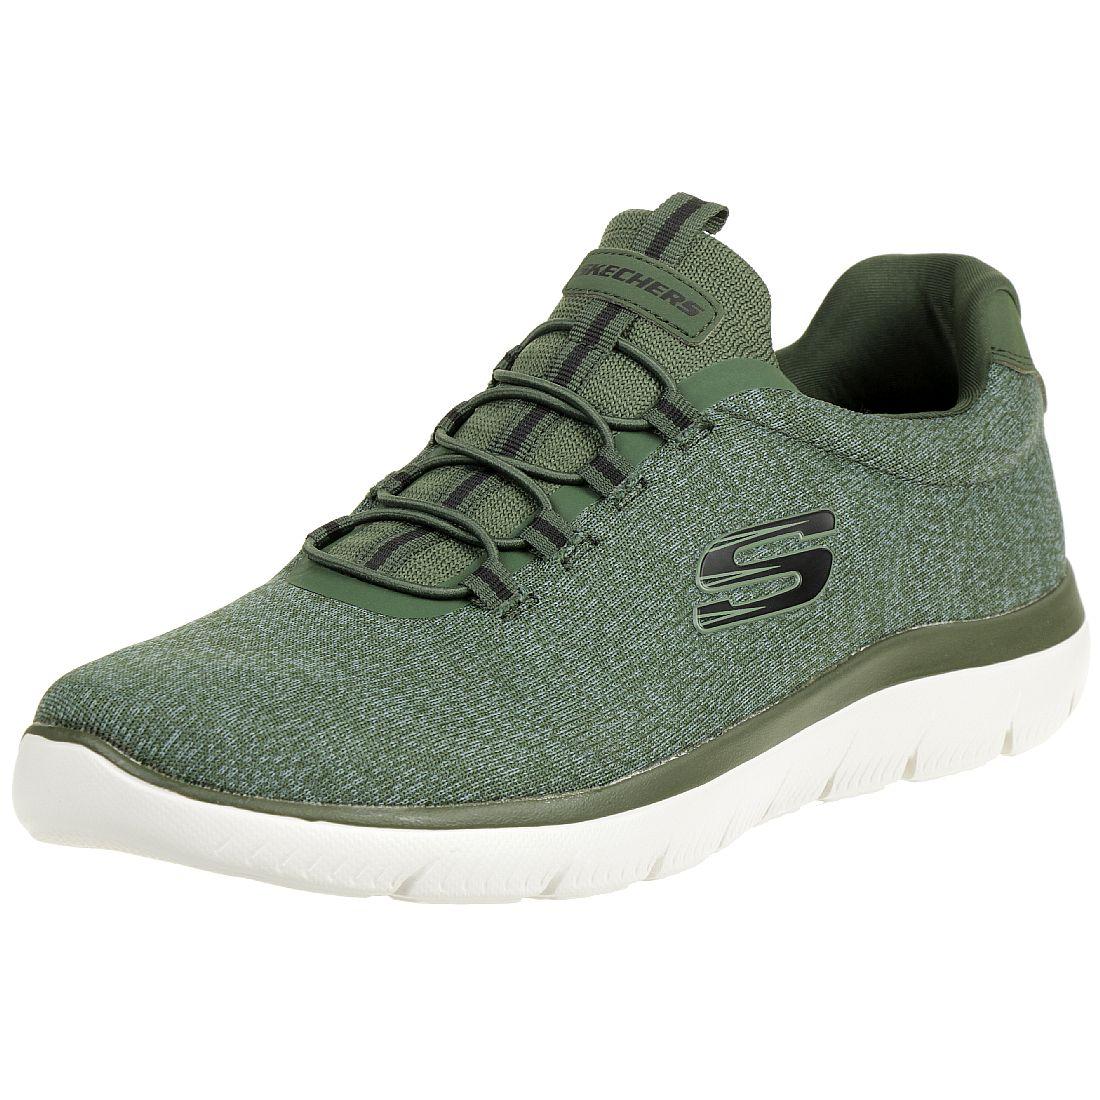 Skechers Sport Mens SUMMITS FORTON Sneakers Herren Schuhe Schwarz, Schuhgröße:41 EU